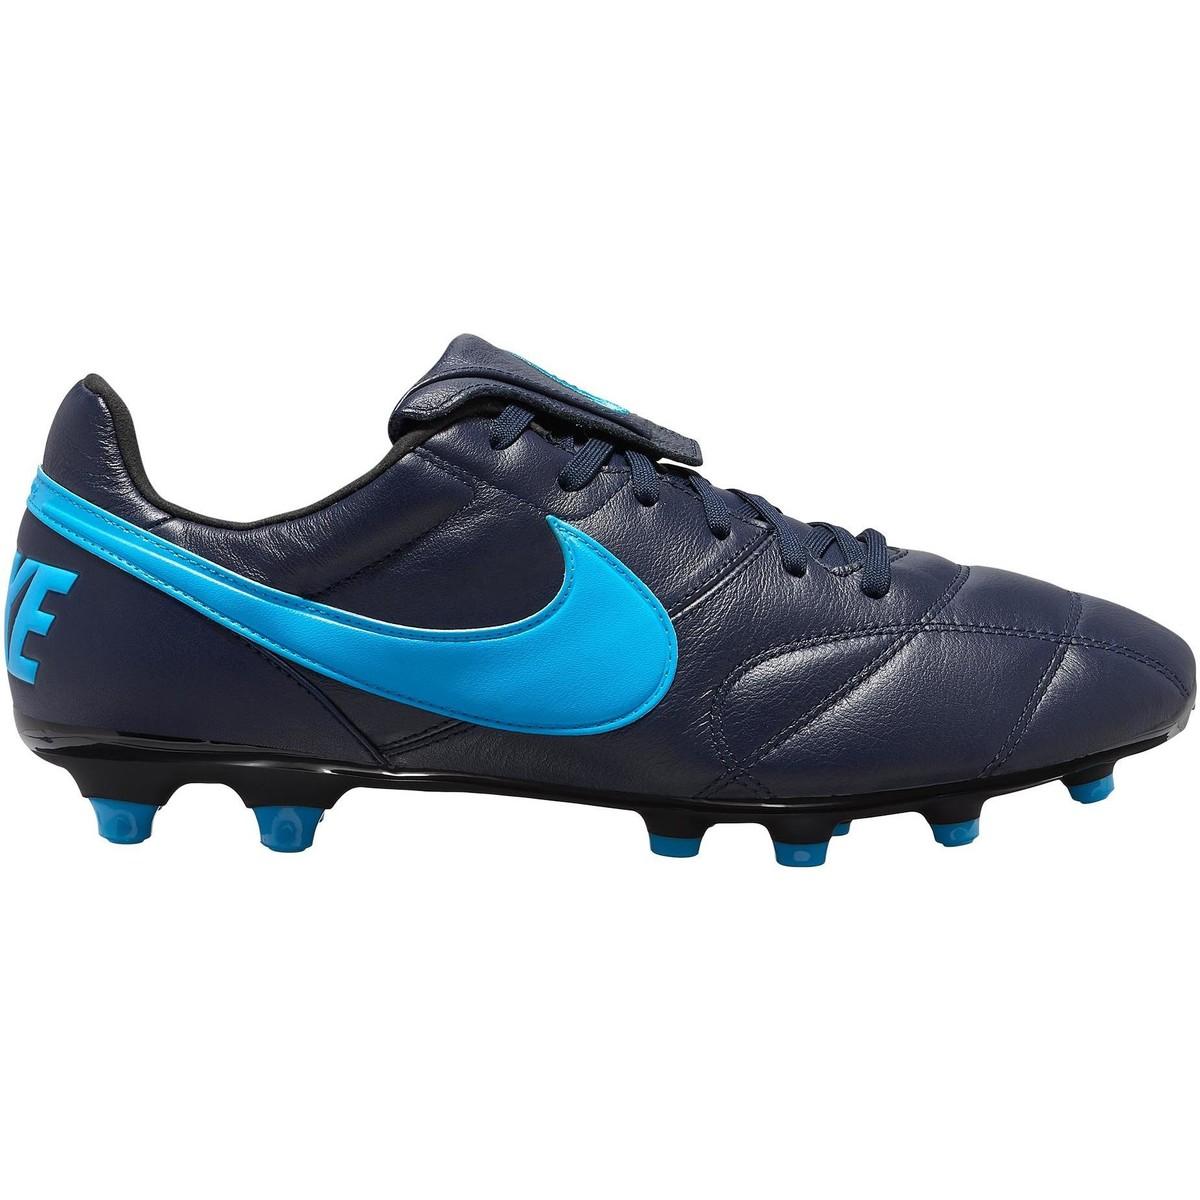 Chaussures Ii Premier Nike De The Fg Foot 3RA4jL5